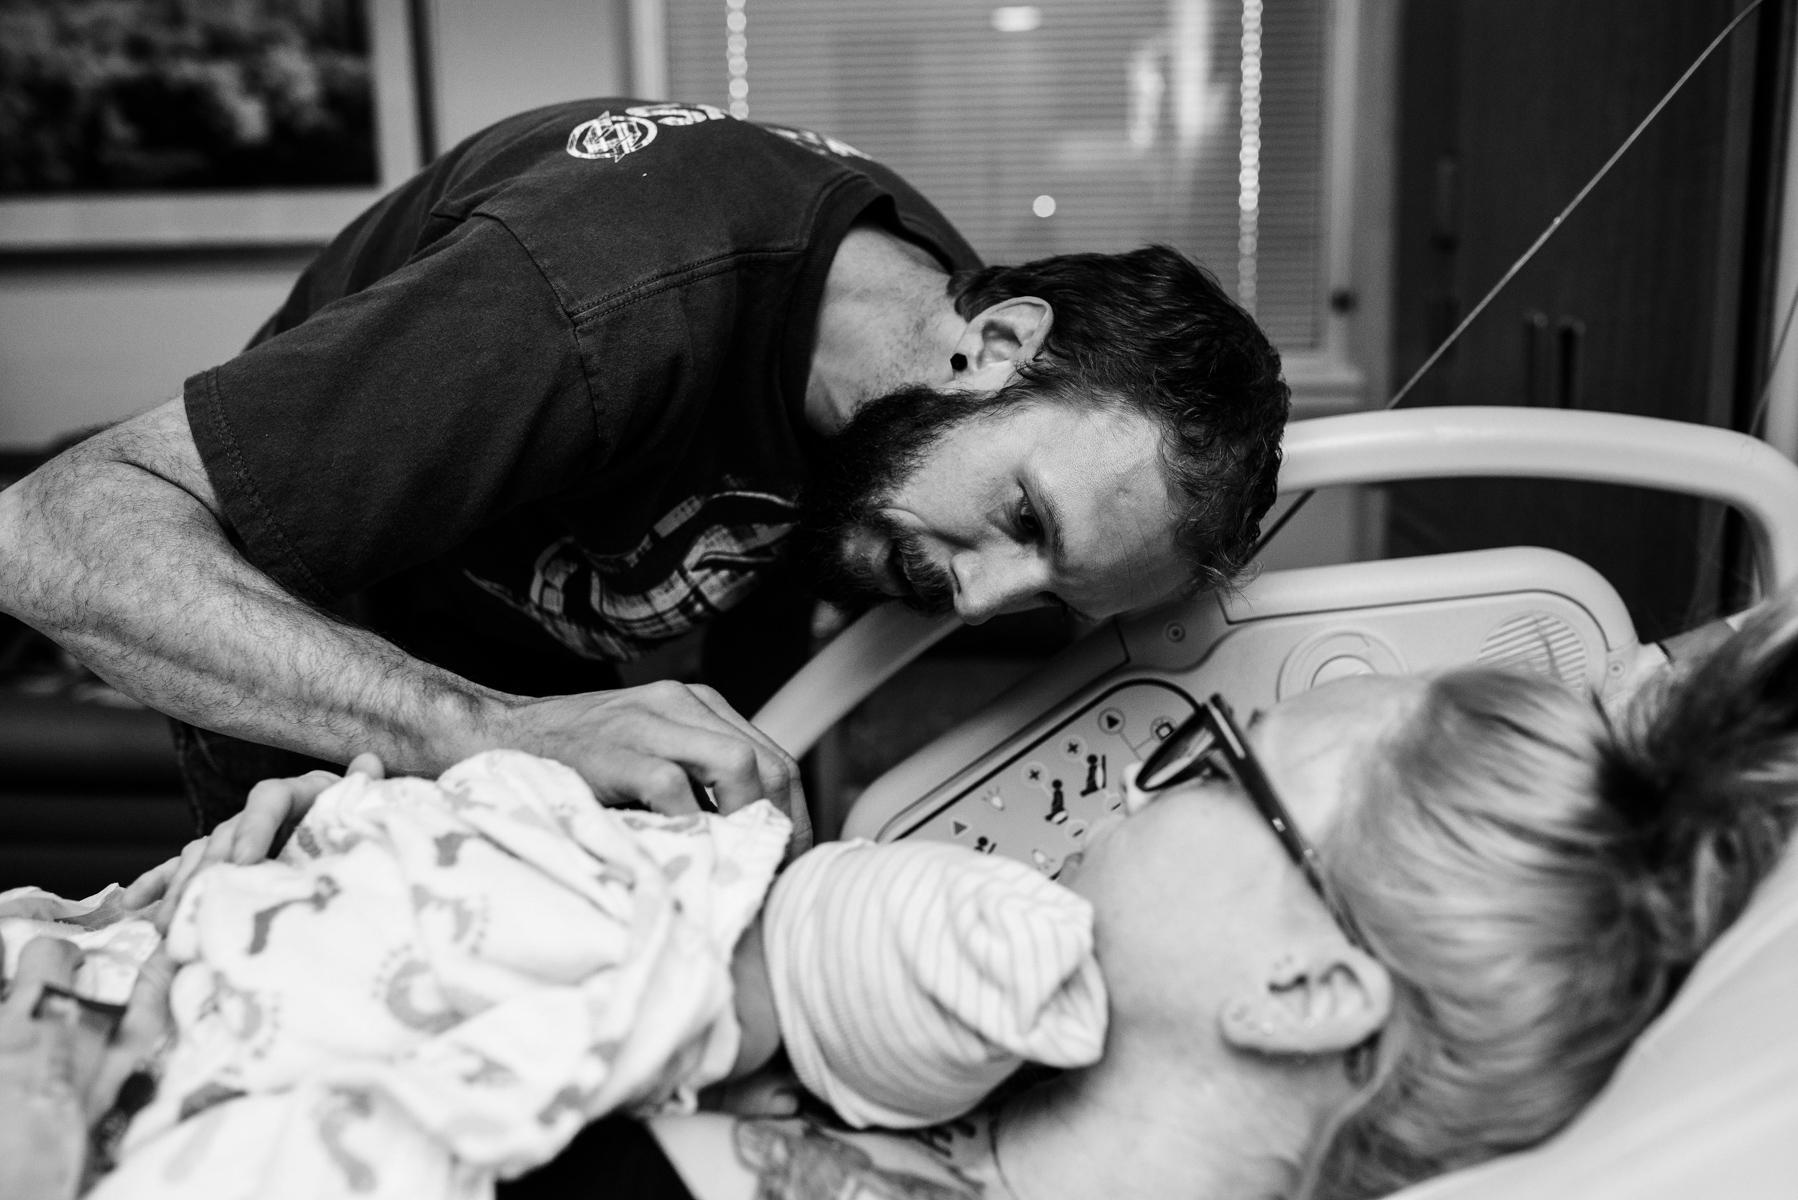 denver-birth-photographer-dad-sees-baby